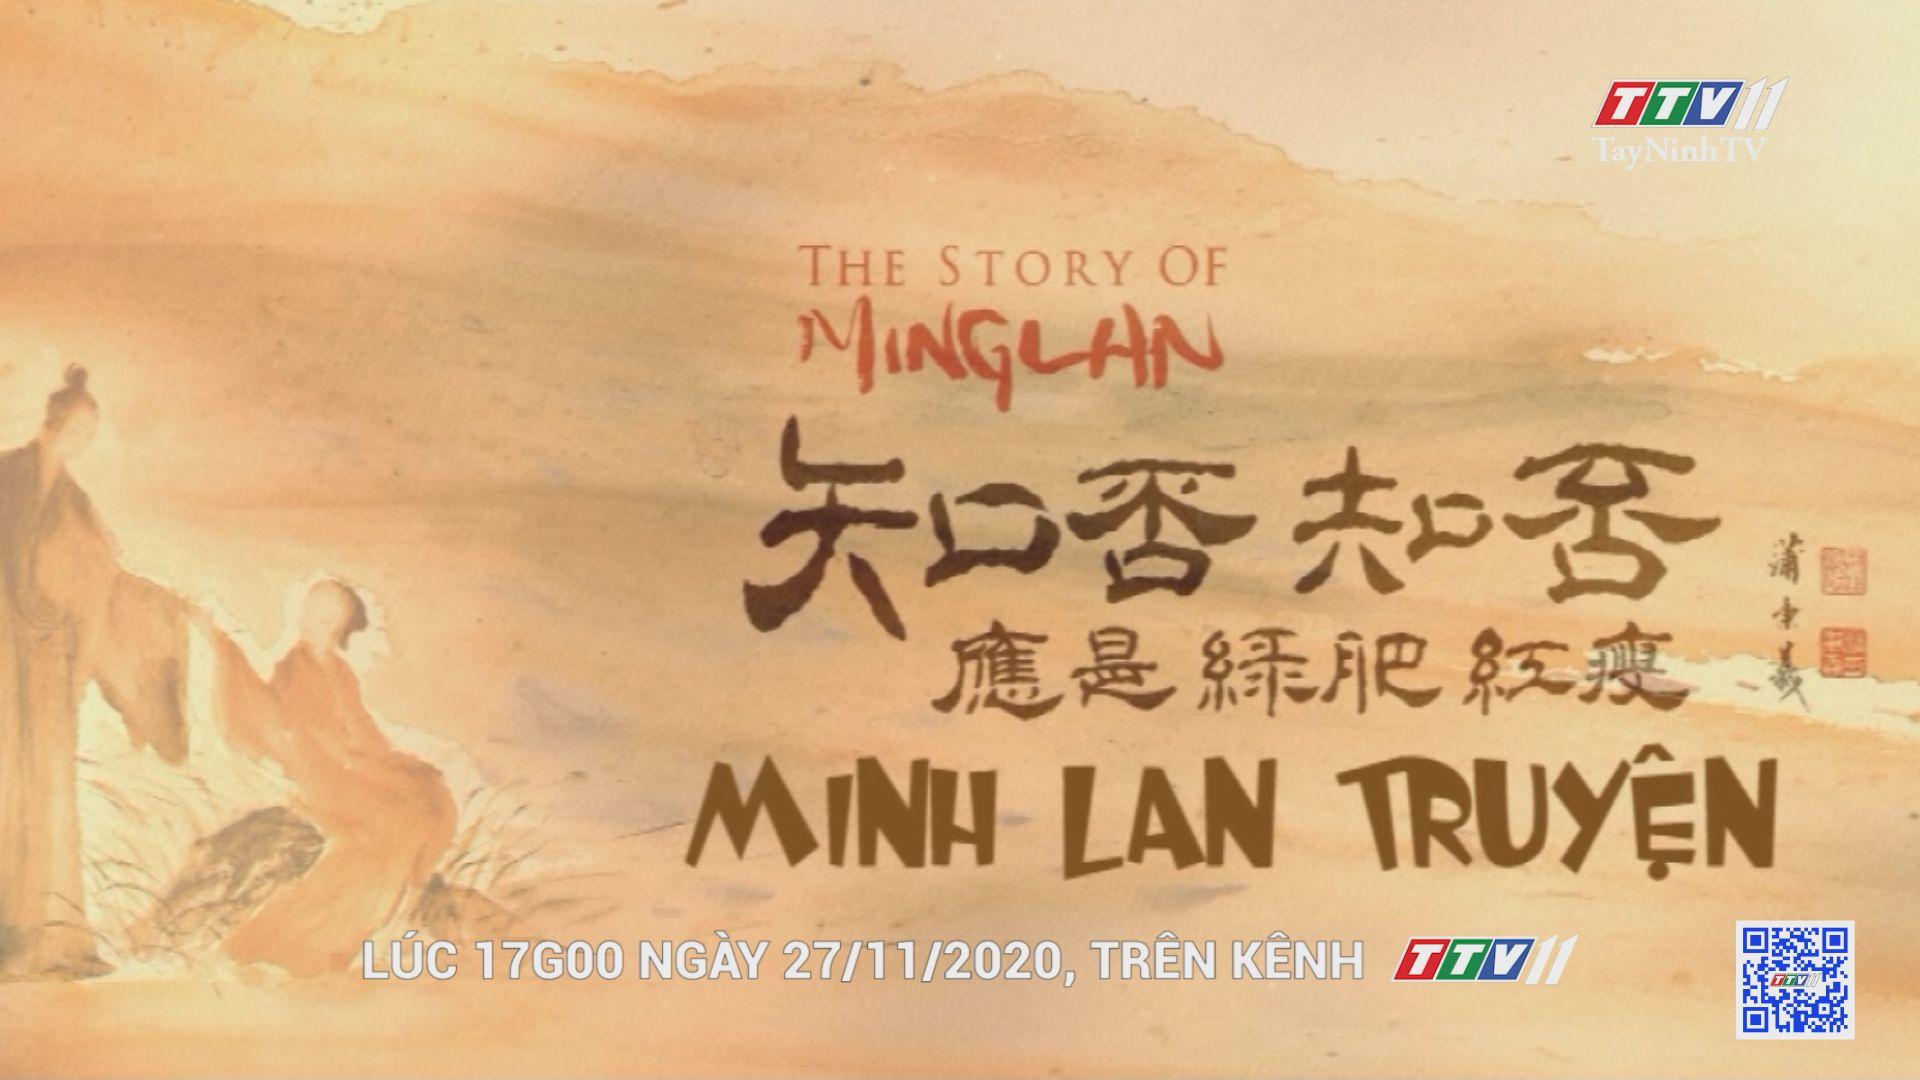 Phim MINH LAN TRUYỆN-Trailer | GIỚI THIỆU PHIM | TayNinhTVE